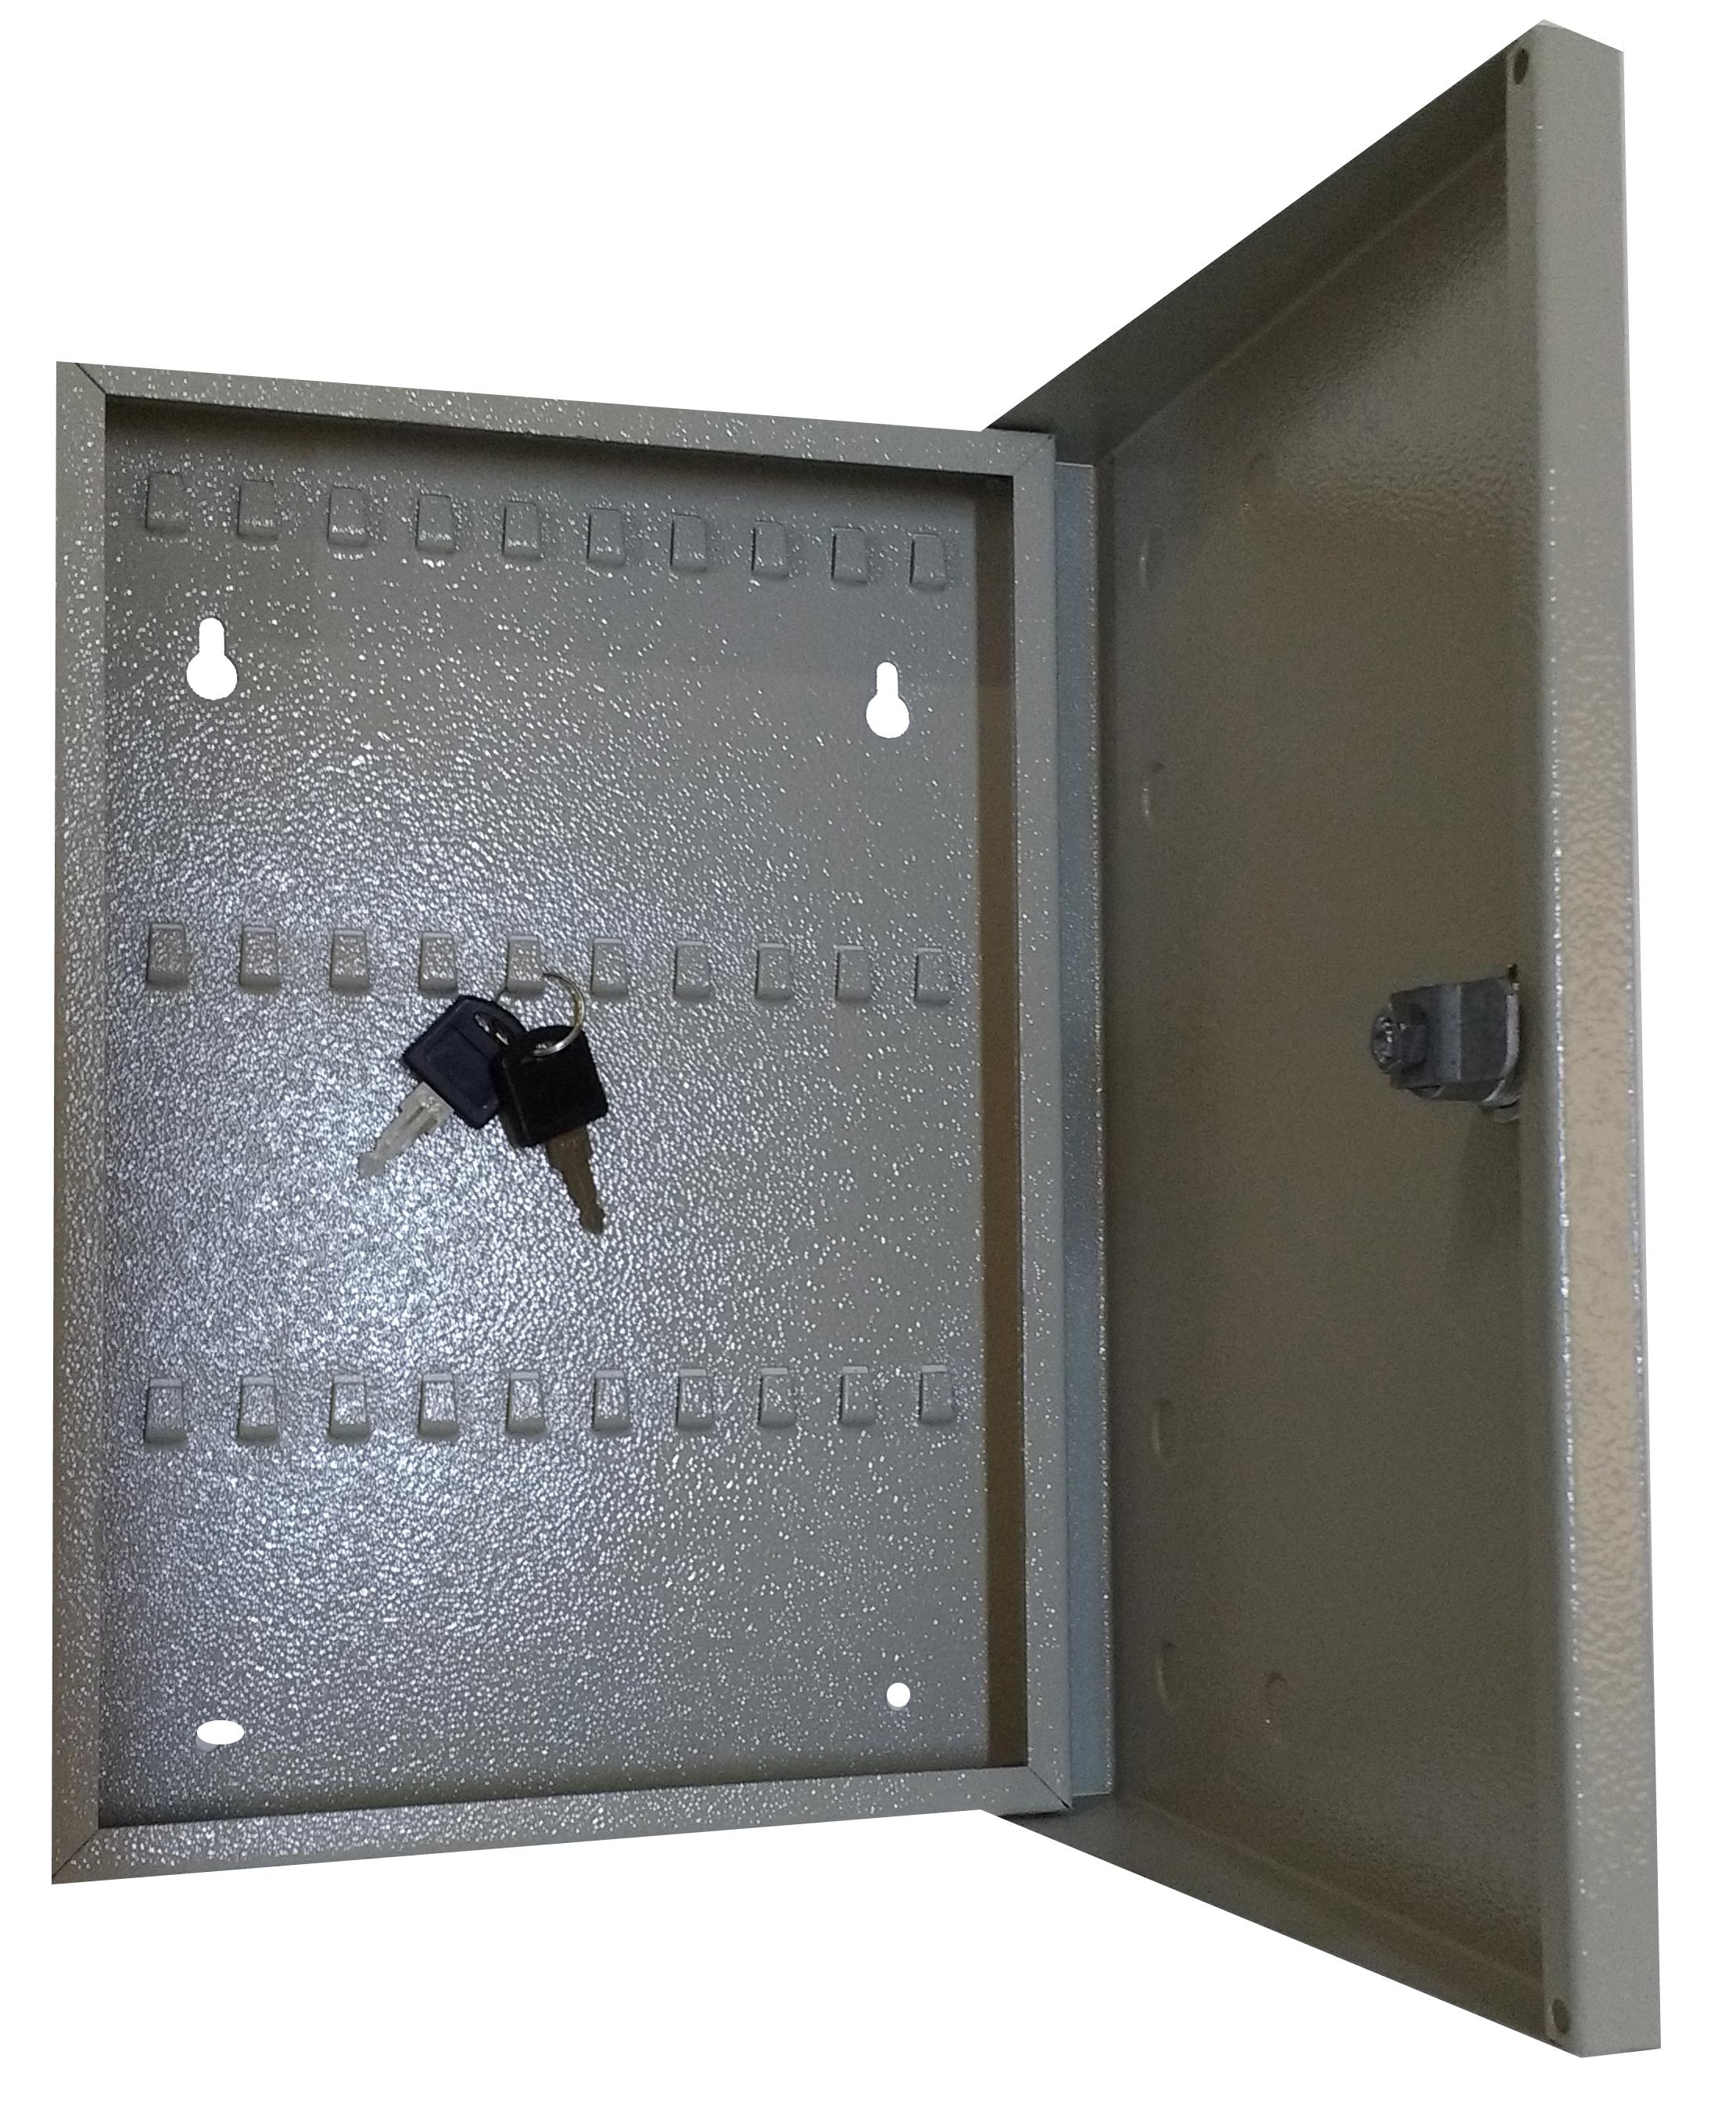 http://www.nilart.com.br/galeria/claviculario-porta-chaves-para-30-chaves-750.030-p.jpg